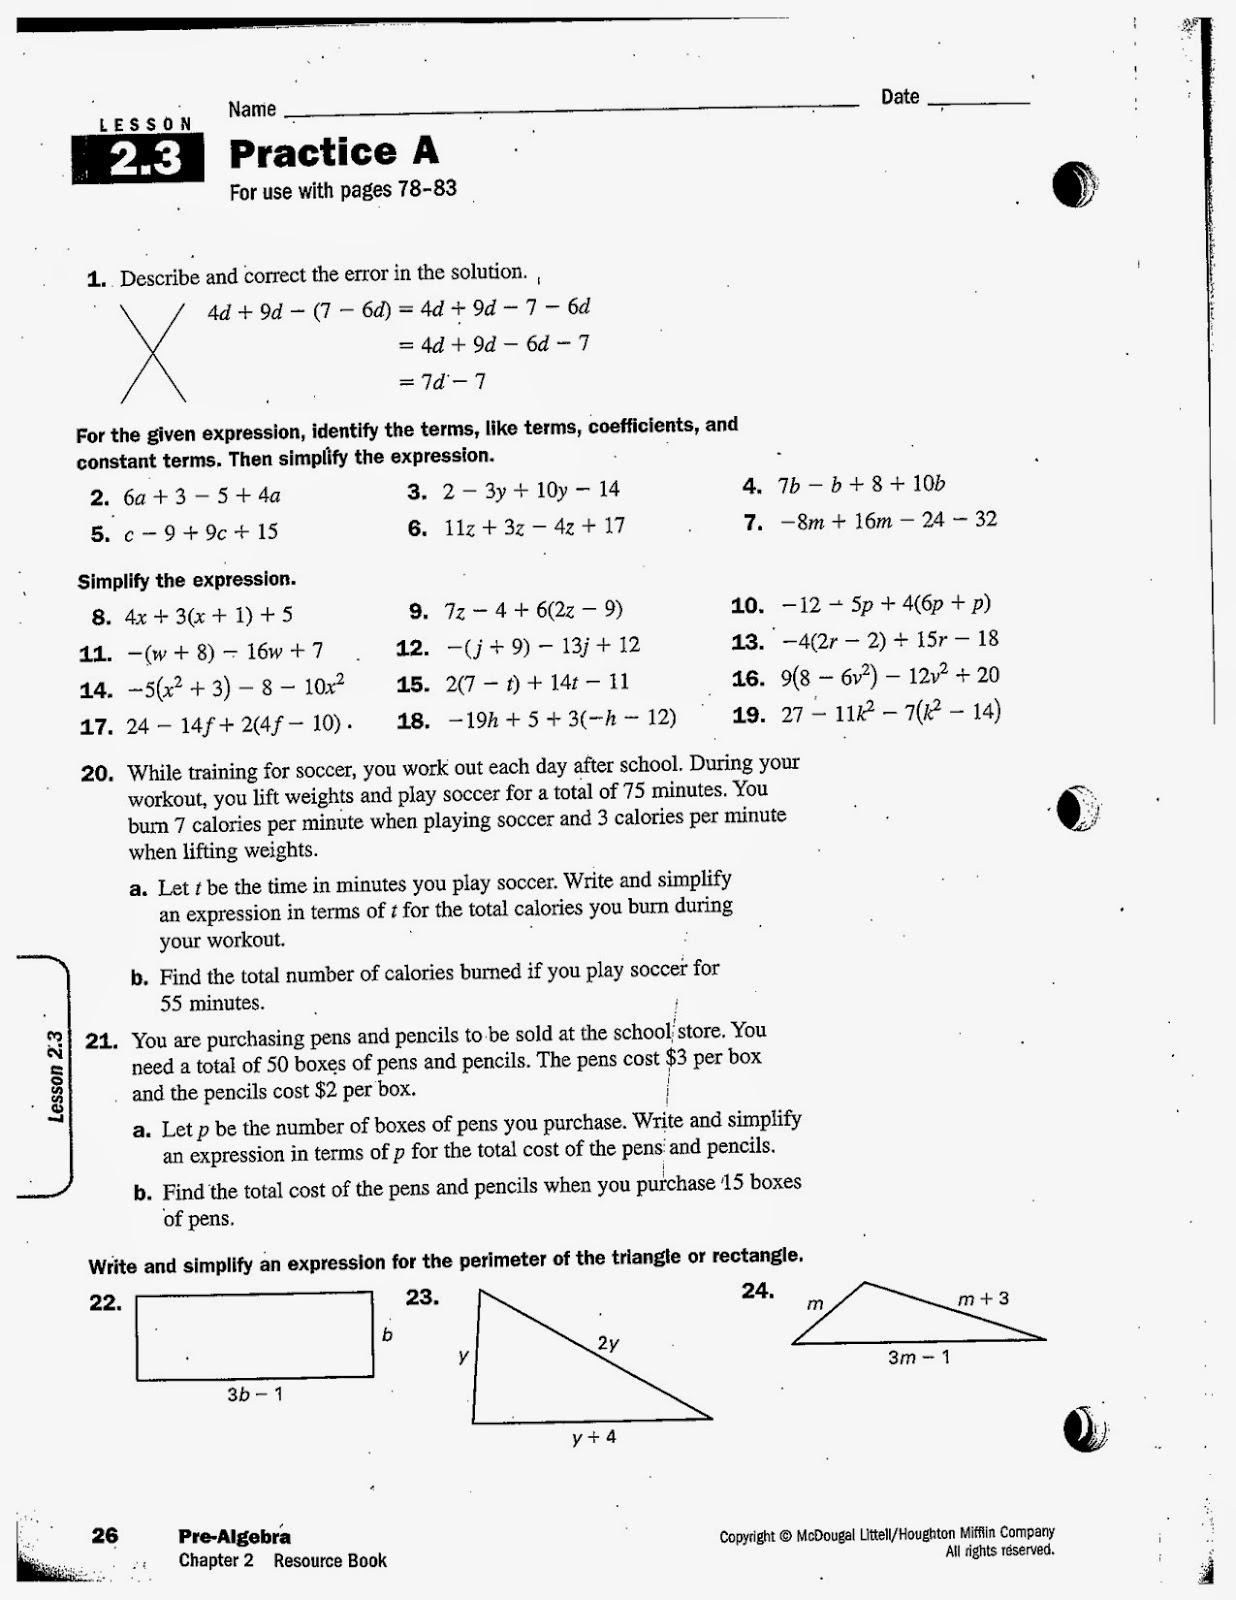 medium resolution of Homework help 7th grade pre algebra: Students Writing